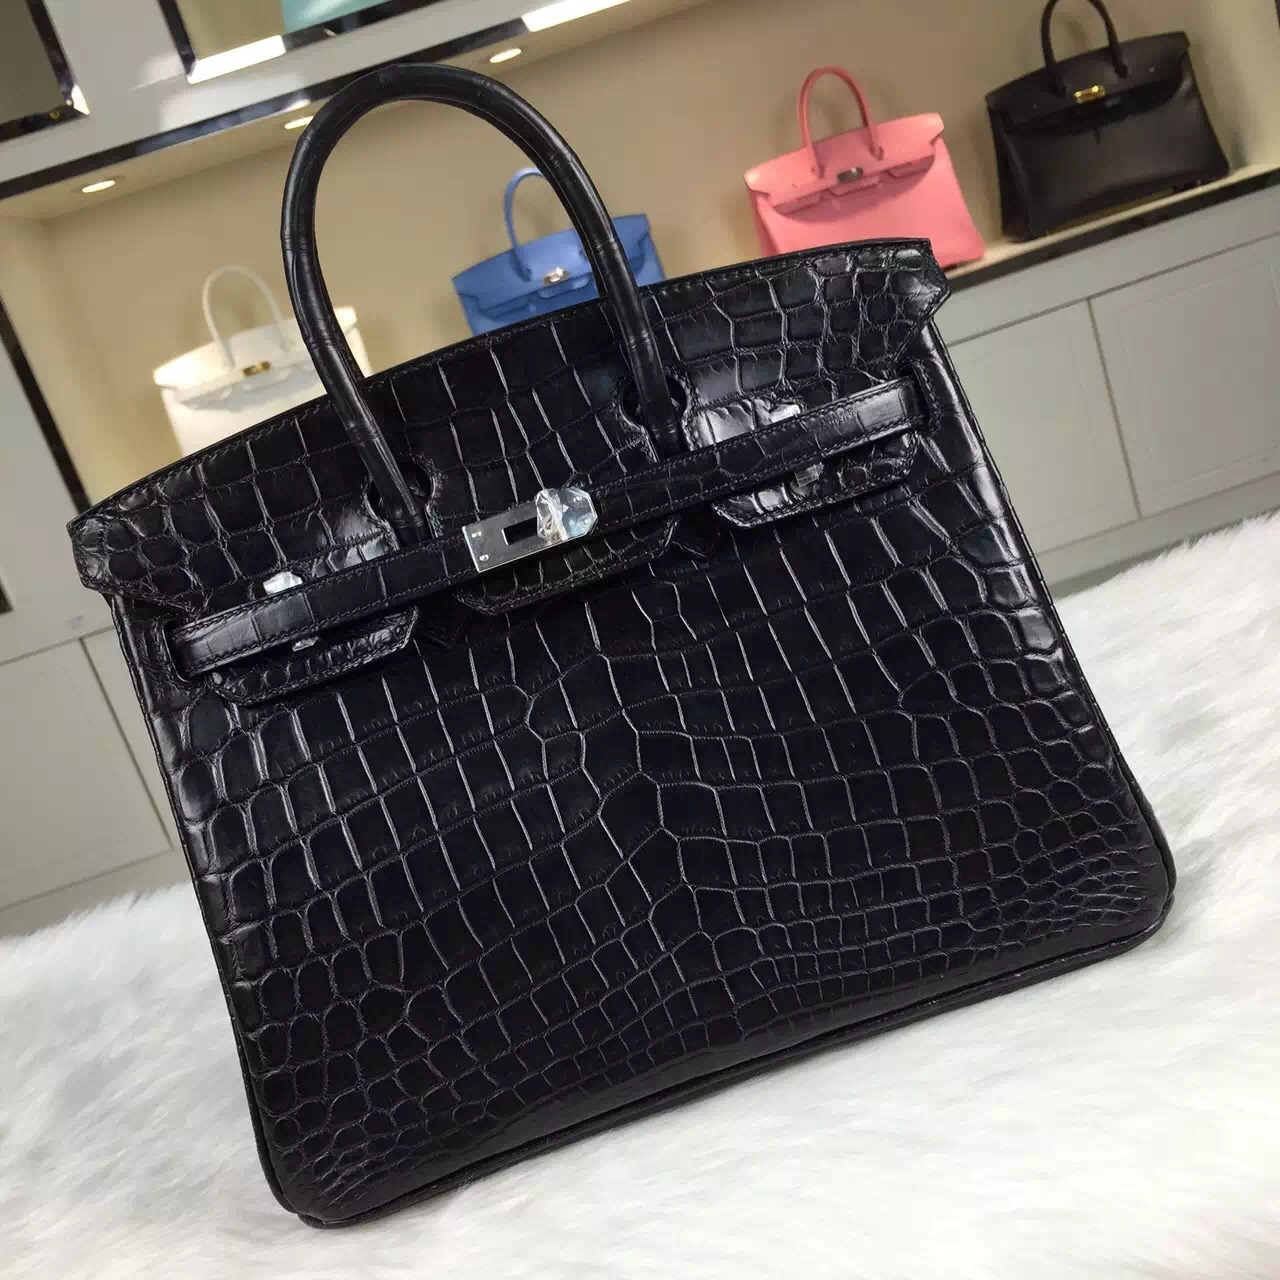 Wholesale Hermes Birkin 25CM Black Crocodile Skin Women's Tote Bag Silver Hardware